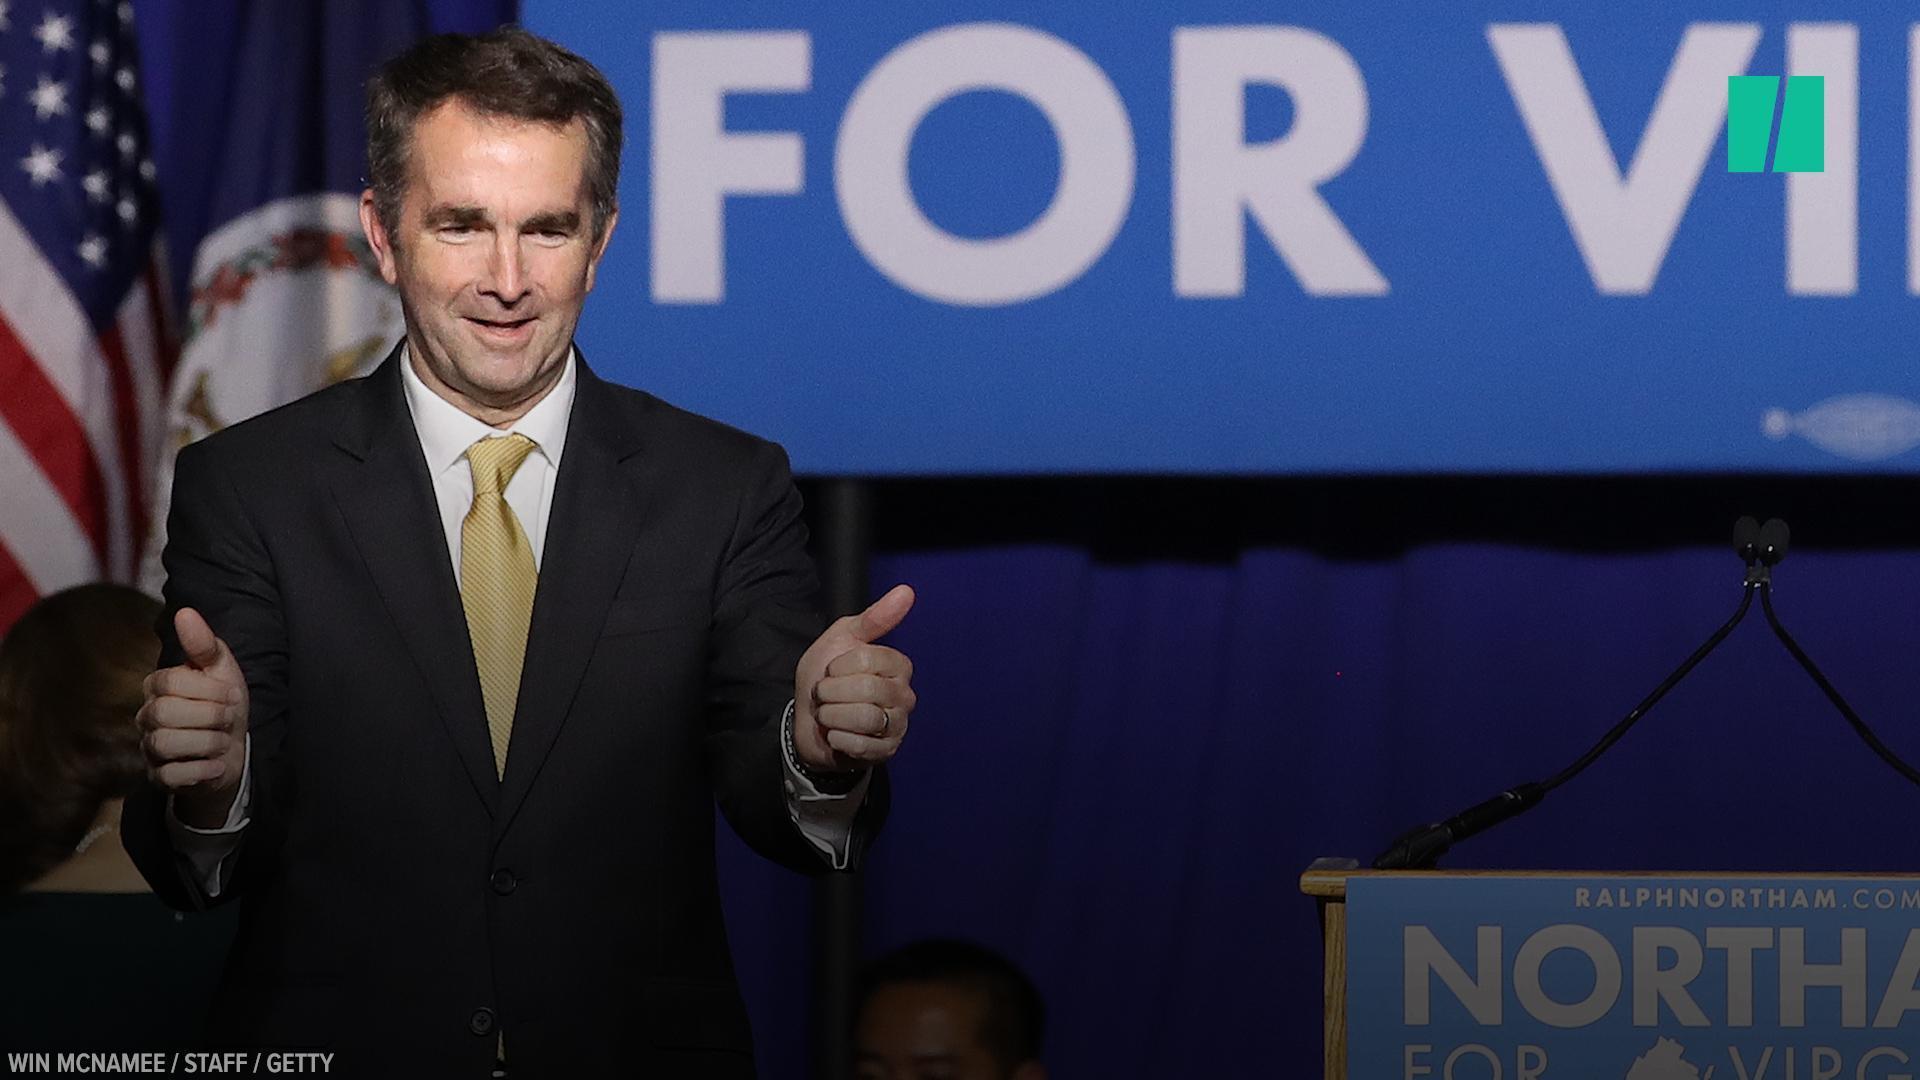 Former RNC Chair Michael Steele Trolls Donald Trump Over Virginia Loss